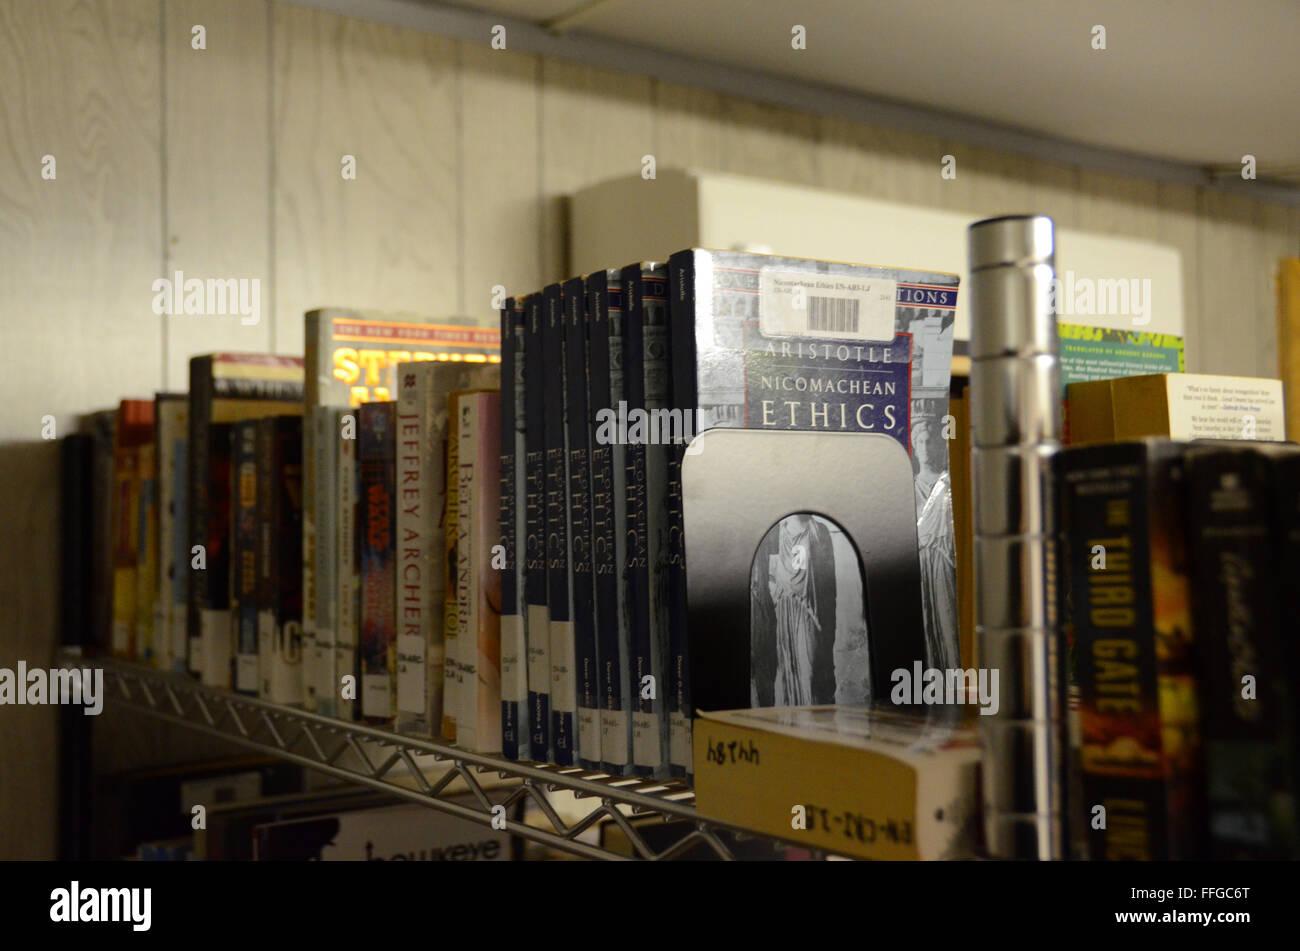 guantanamo bay cuba gtmo camp delta library book shelves - Stock Image